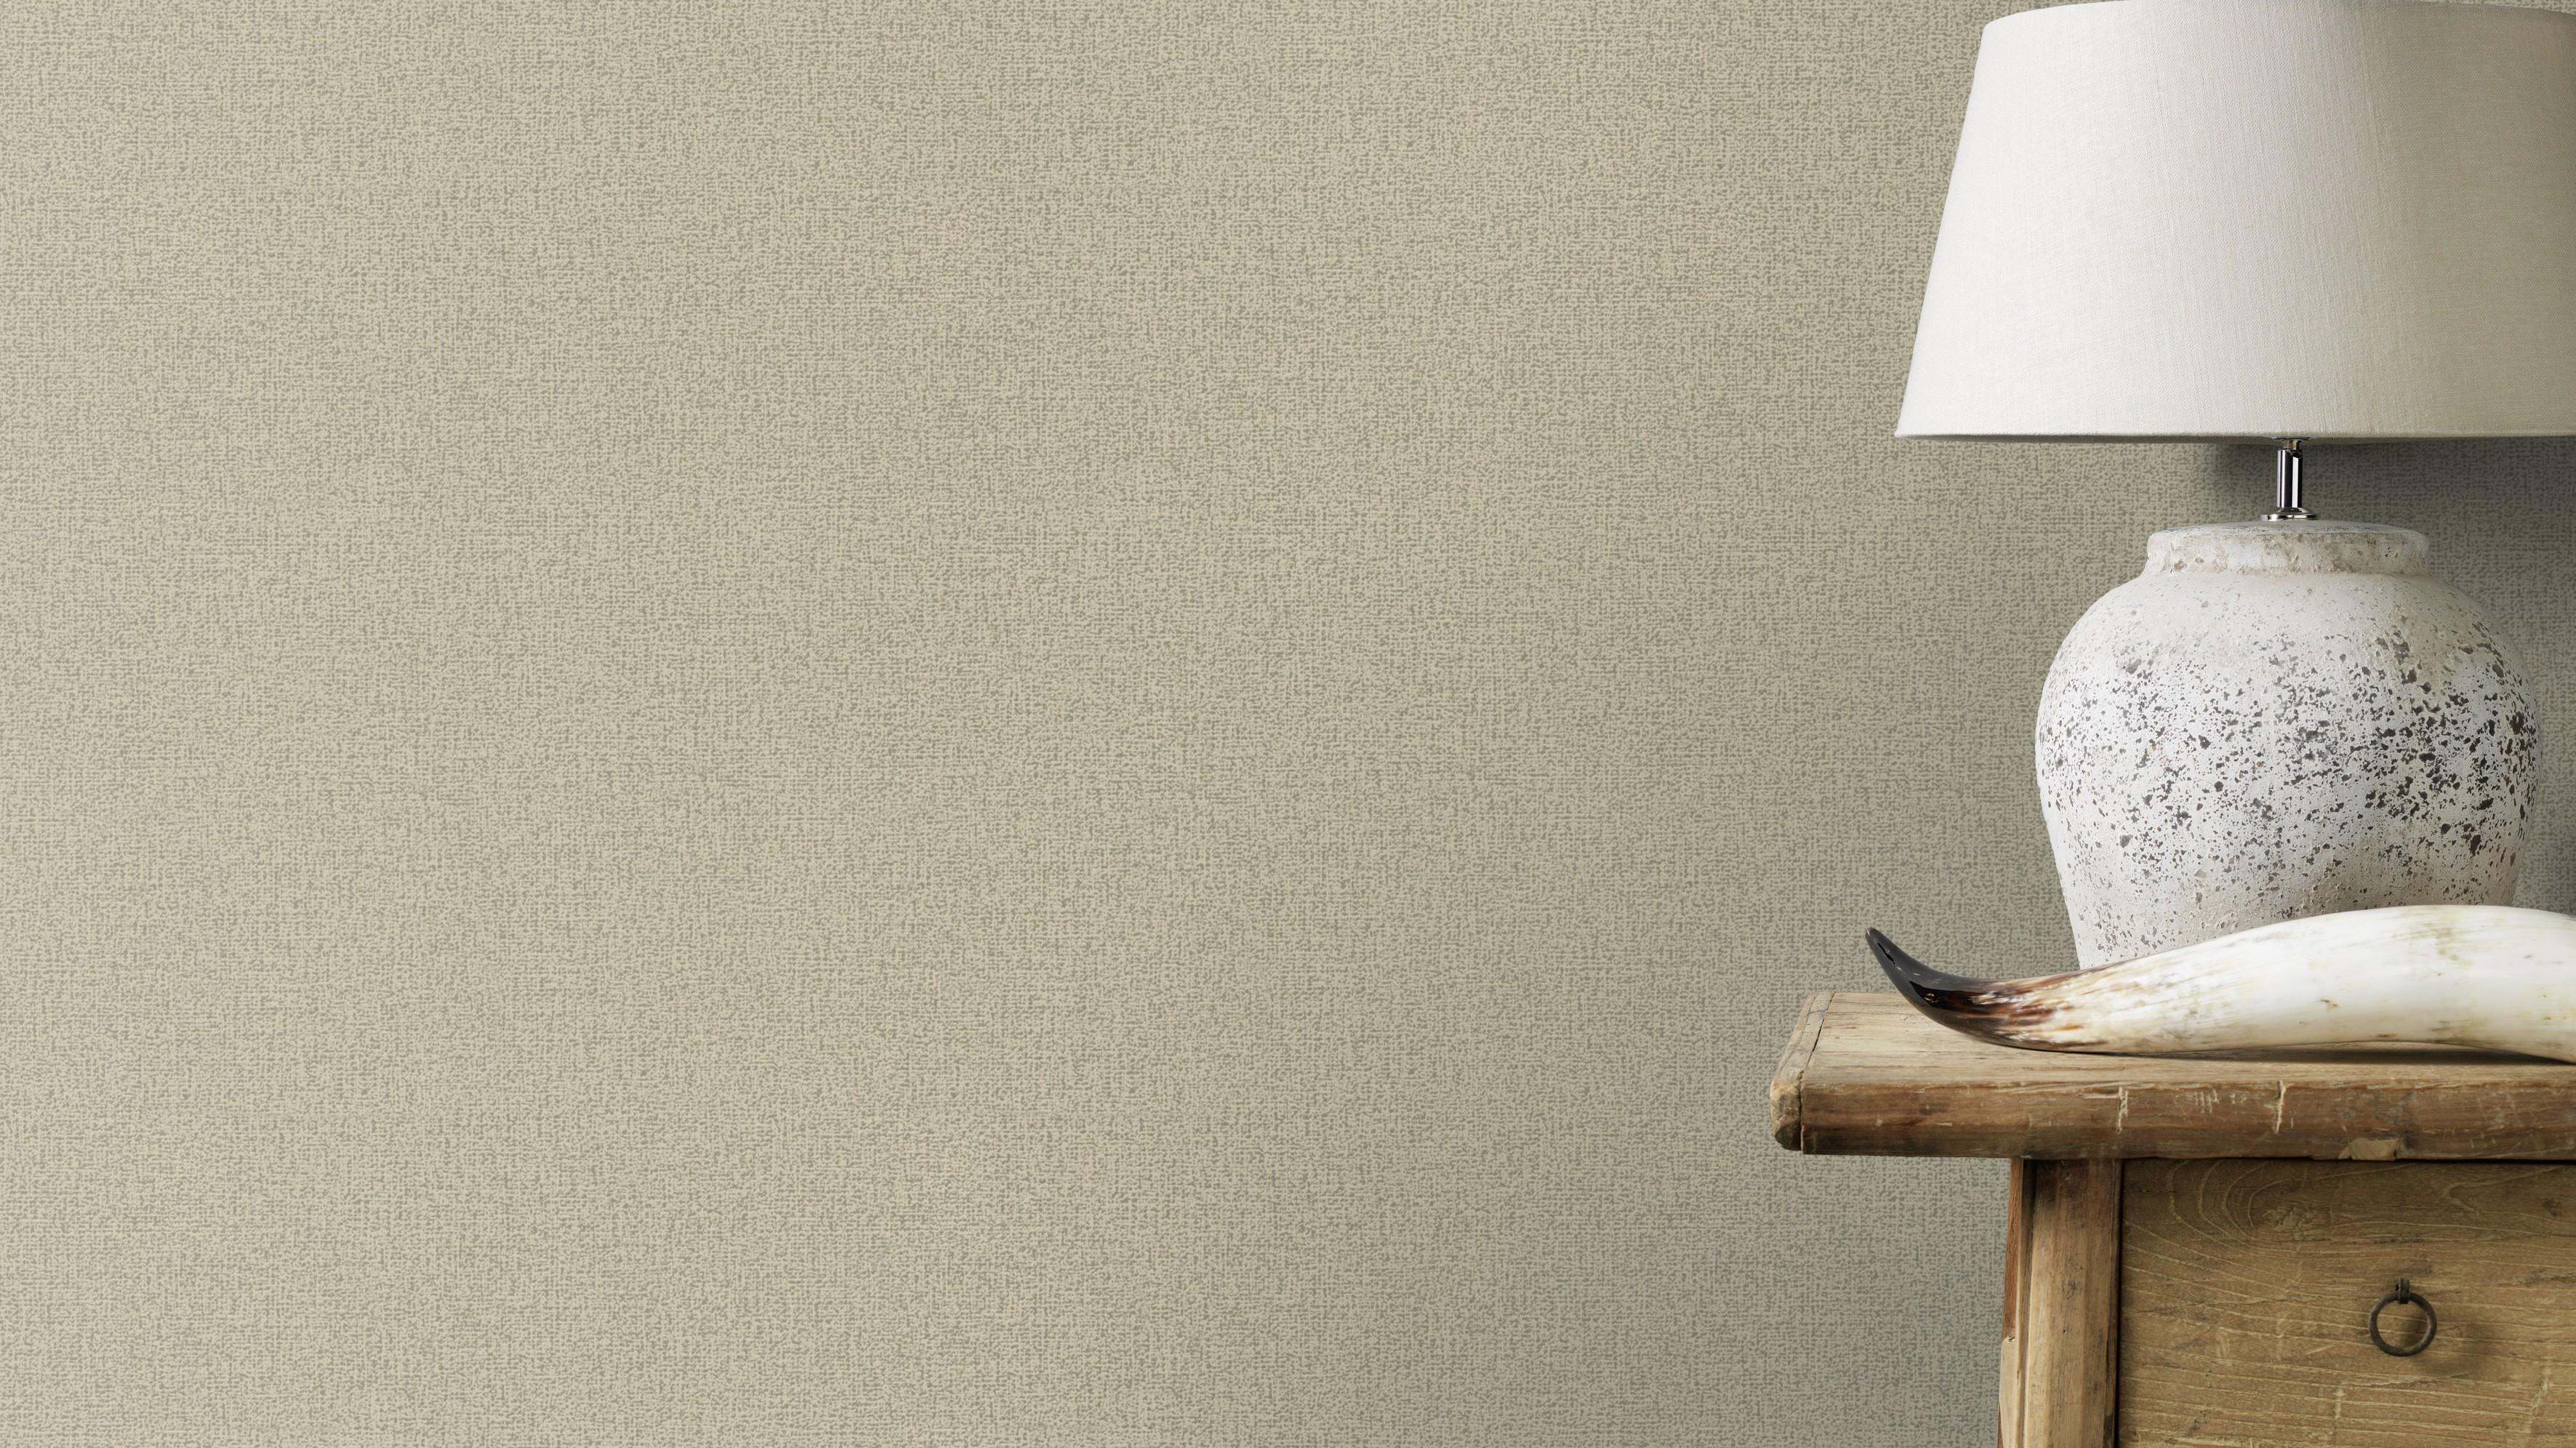 Bézs-taupe színű strukturált tapéta